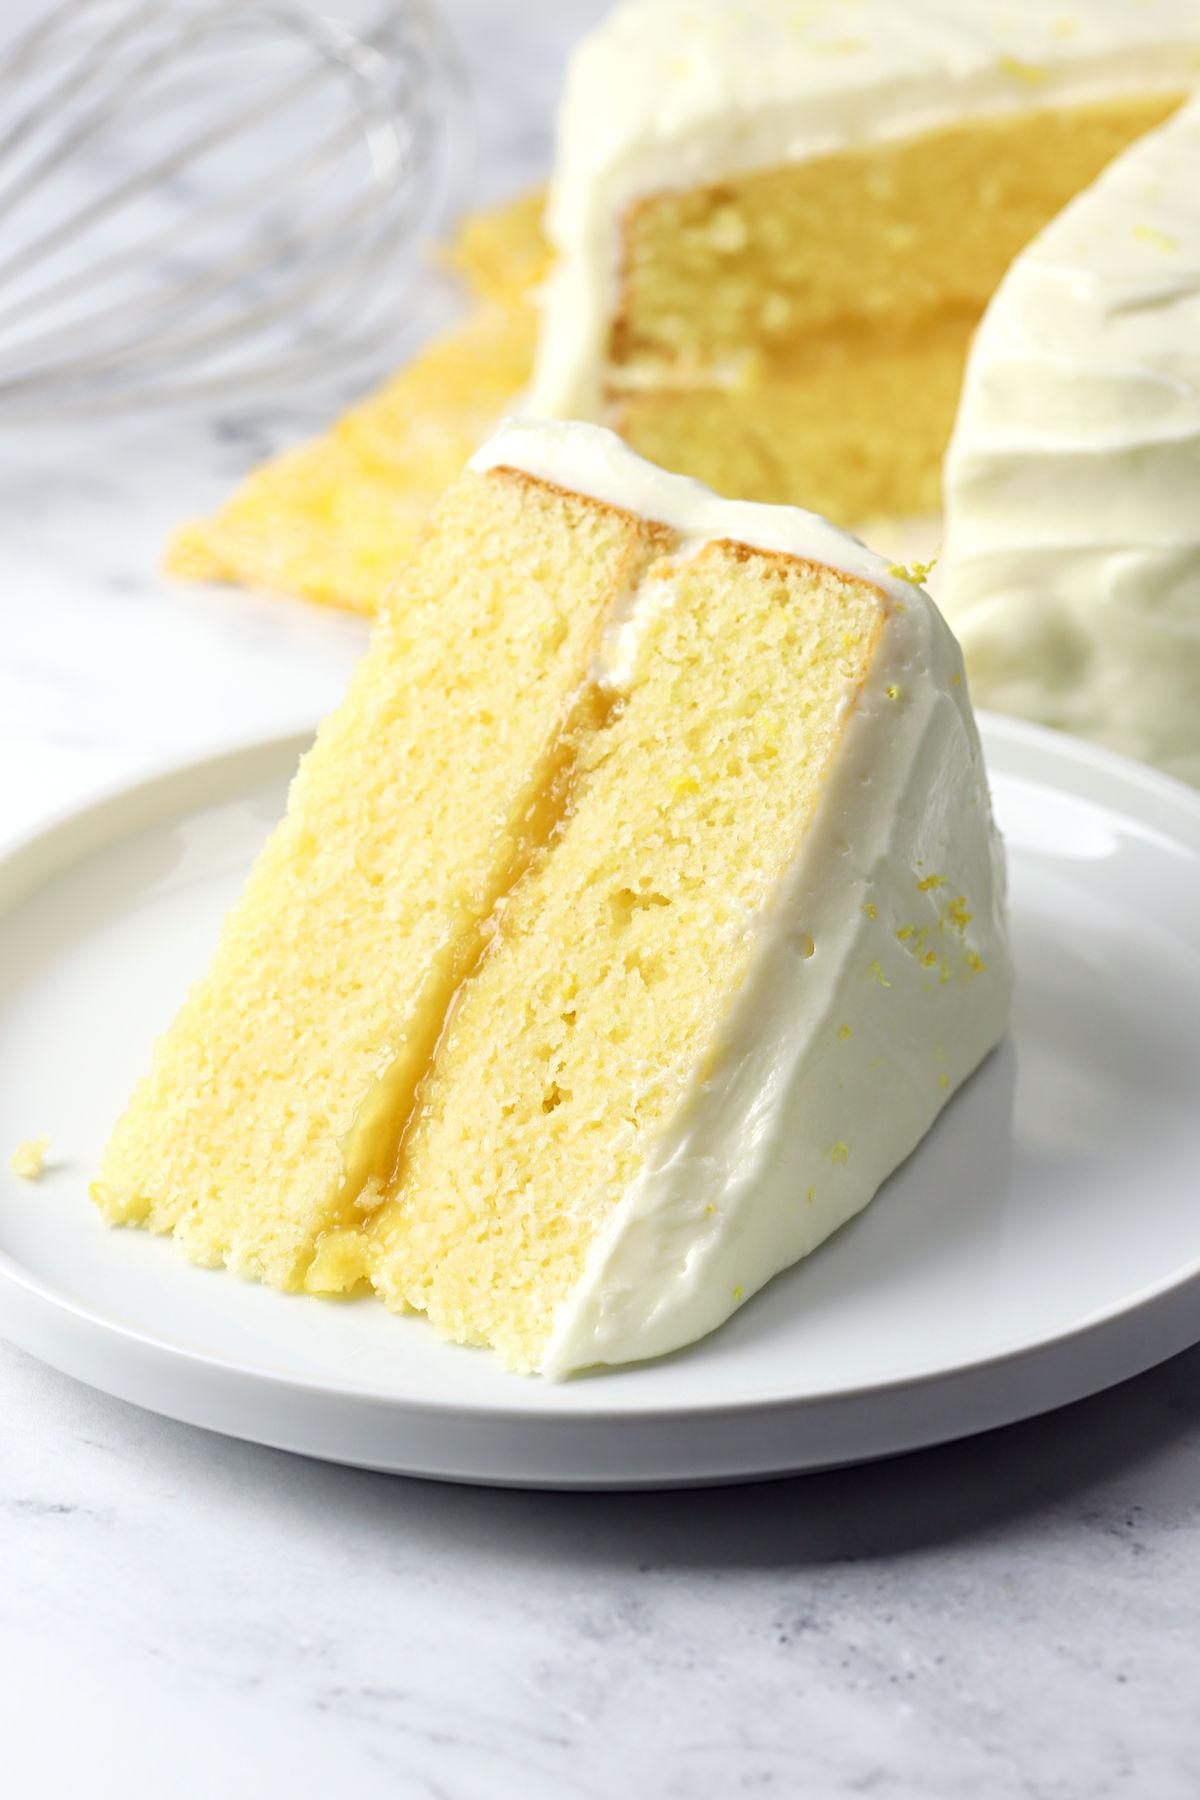 Slice of lemon layer cake on a white plate.